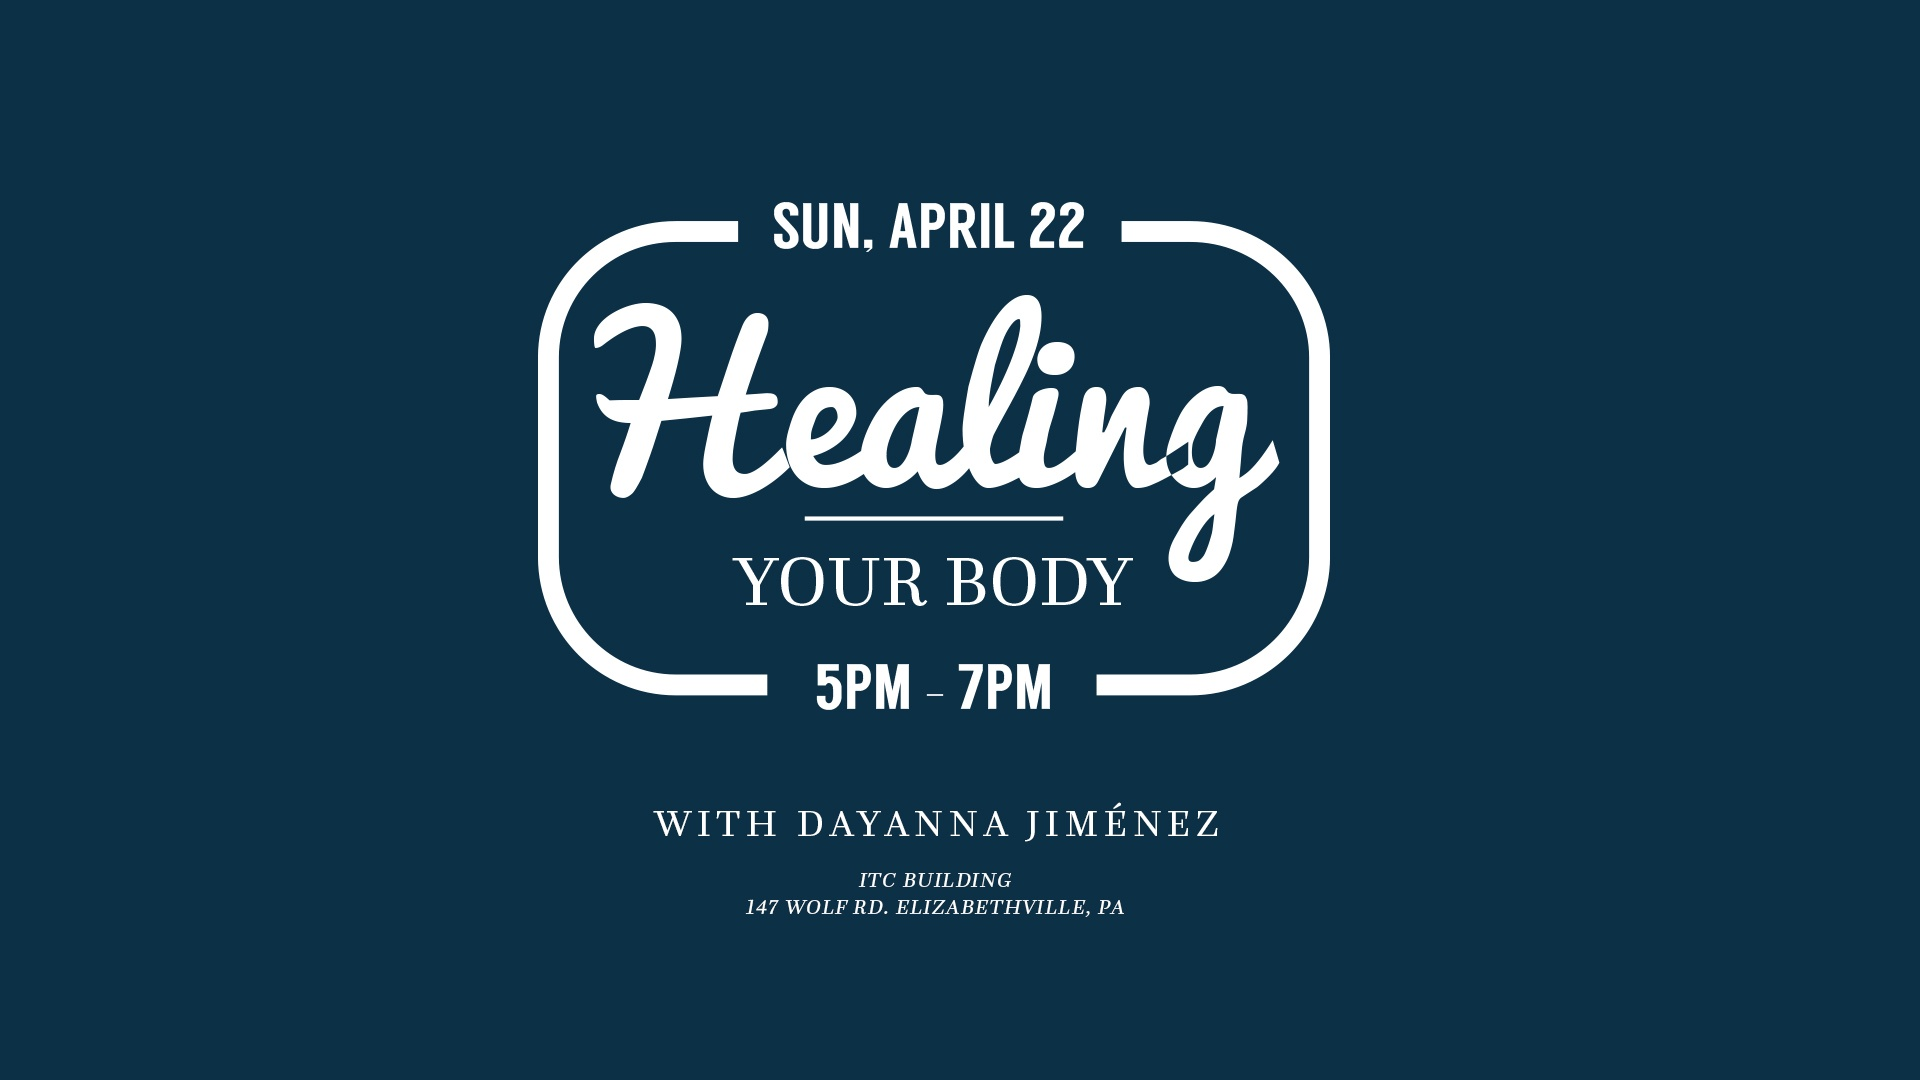 Healing Your Body with Dayanna Jimenez